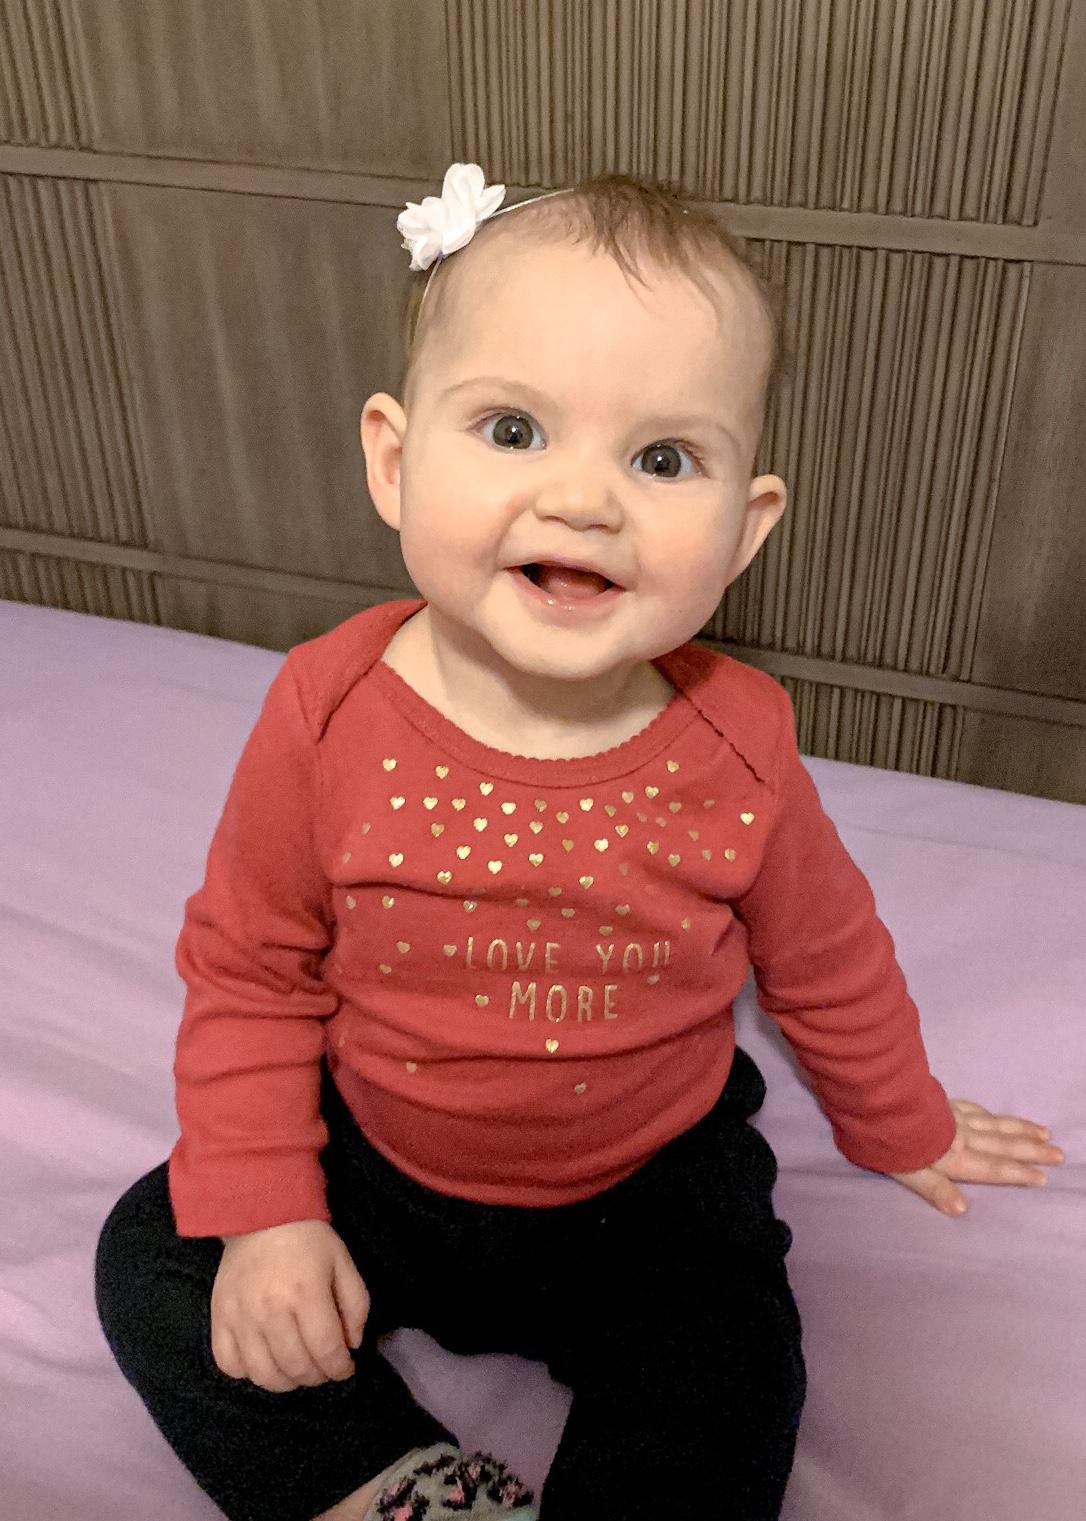 8 Months of Iyla Noelle